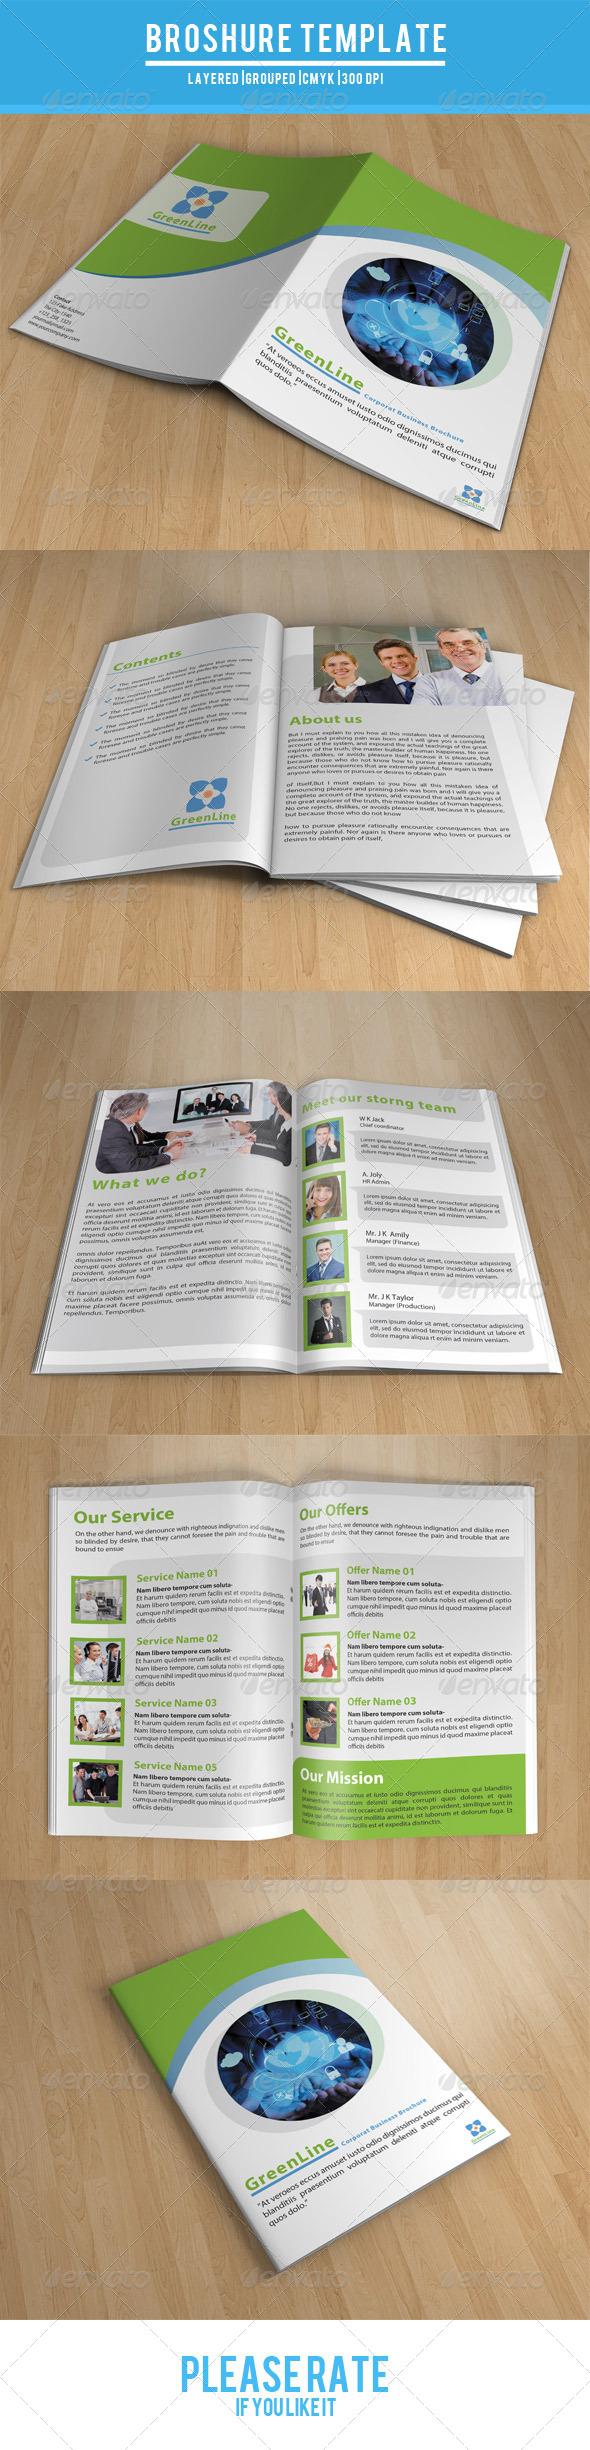 GraphicRiver Bifold Business Brochure-V26 7857815